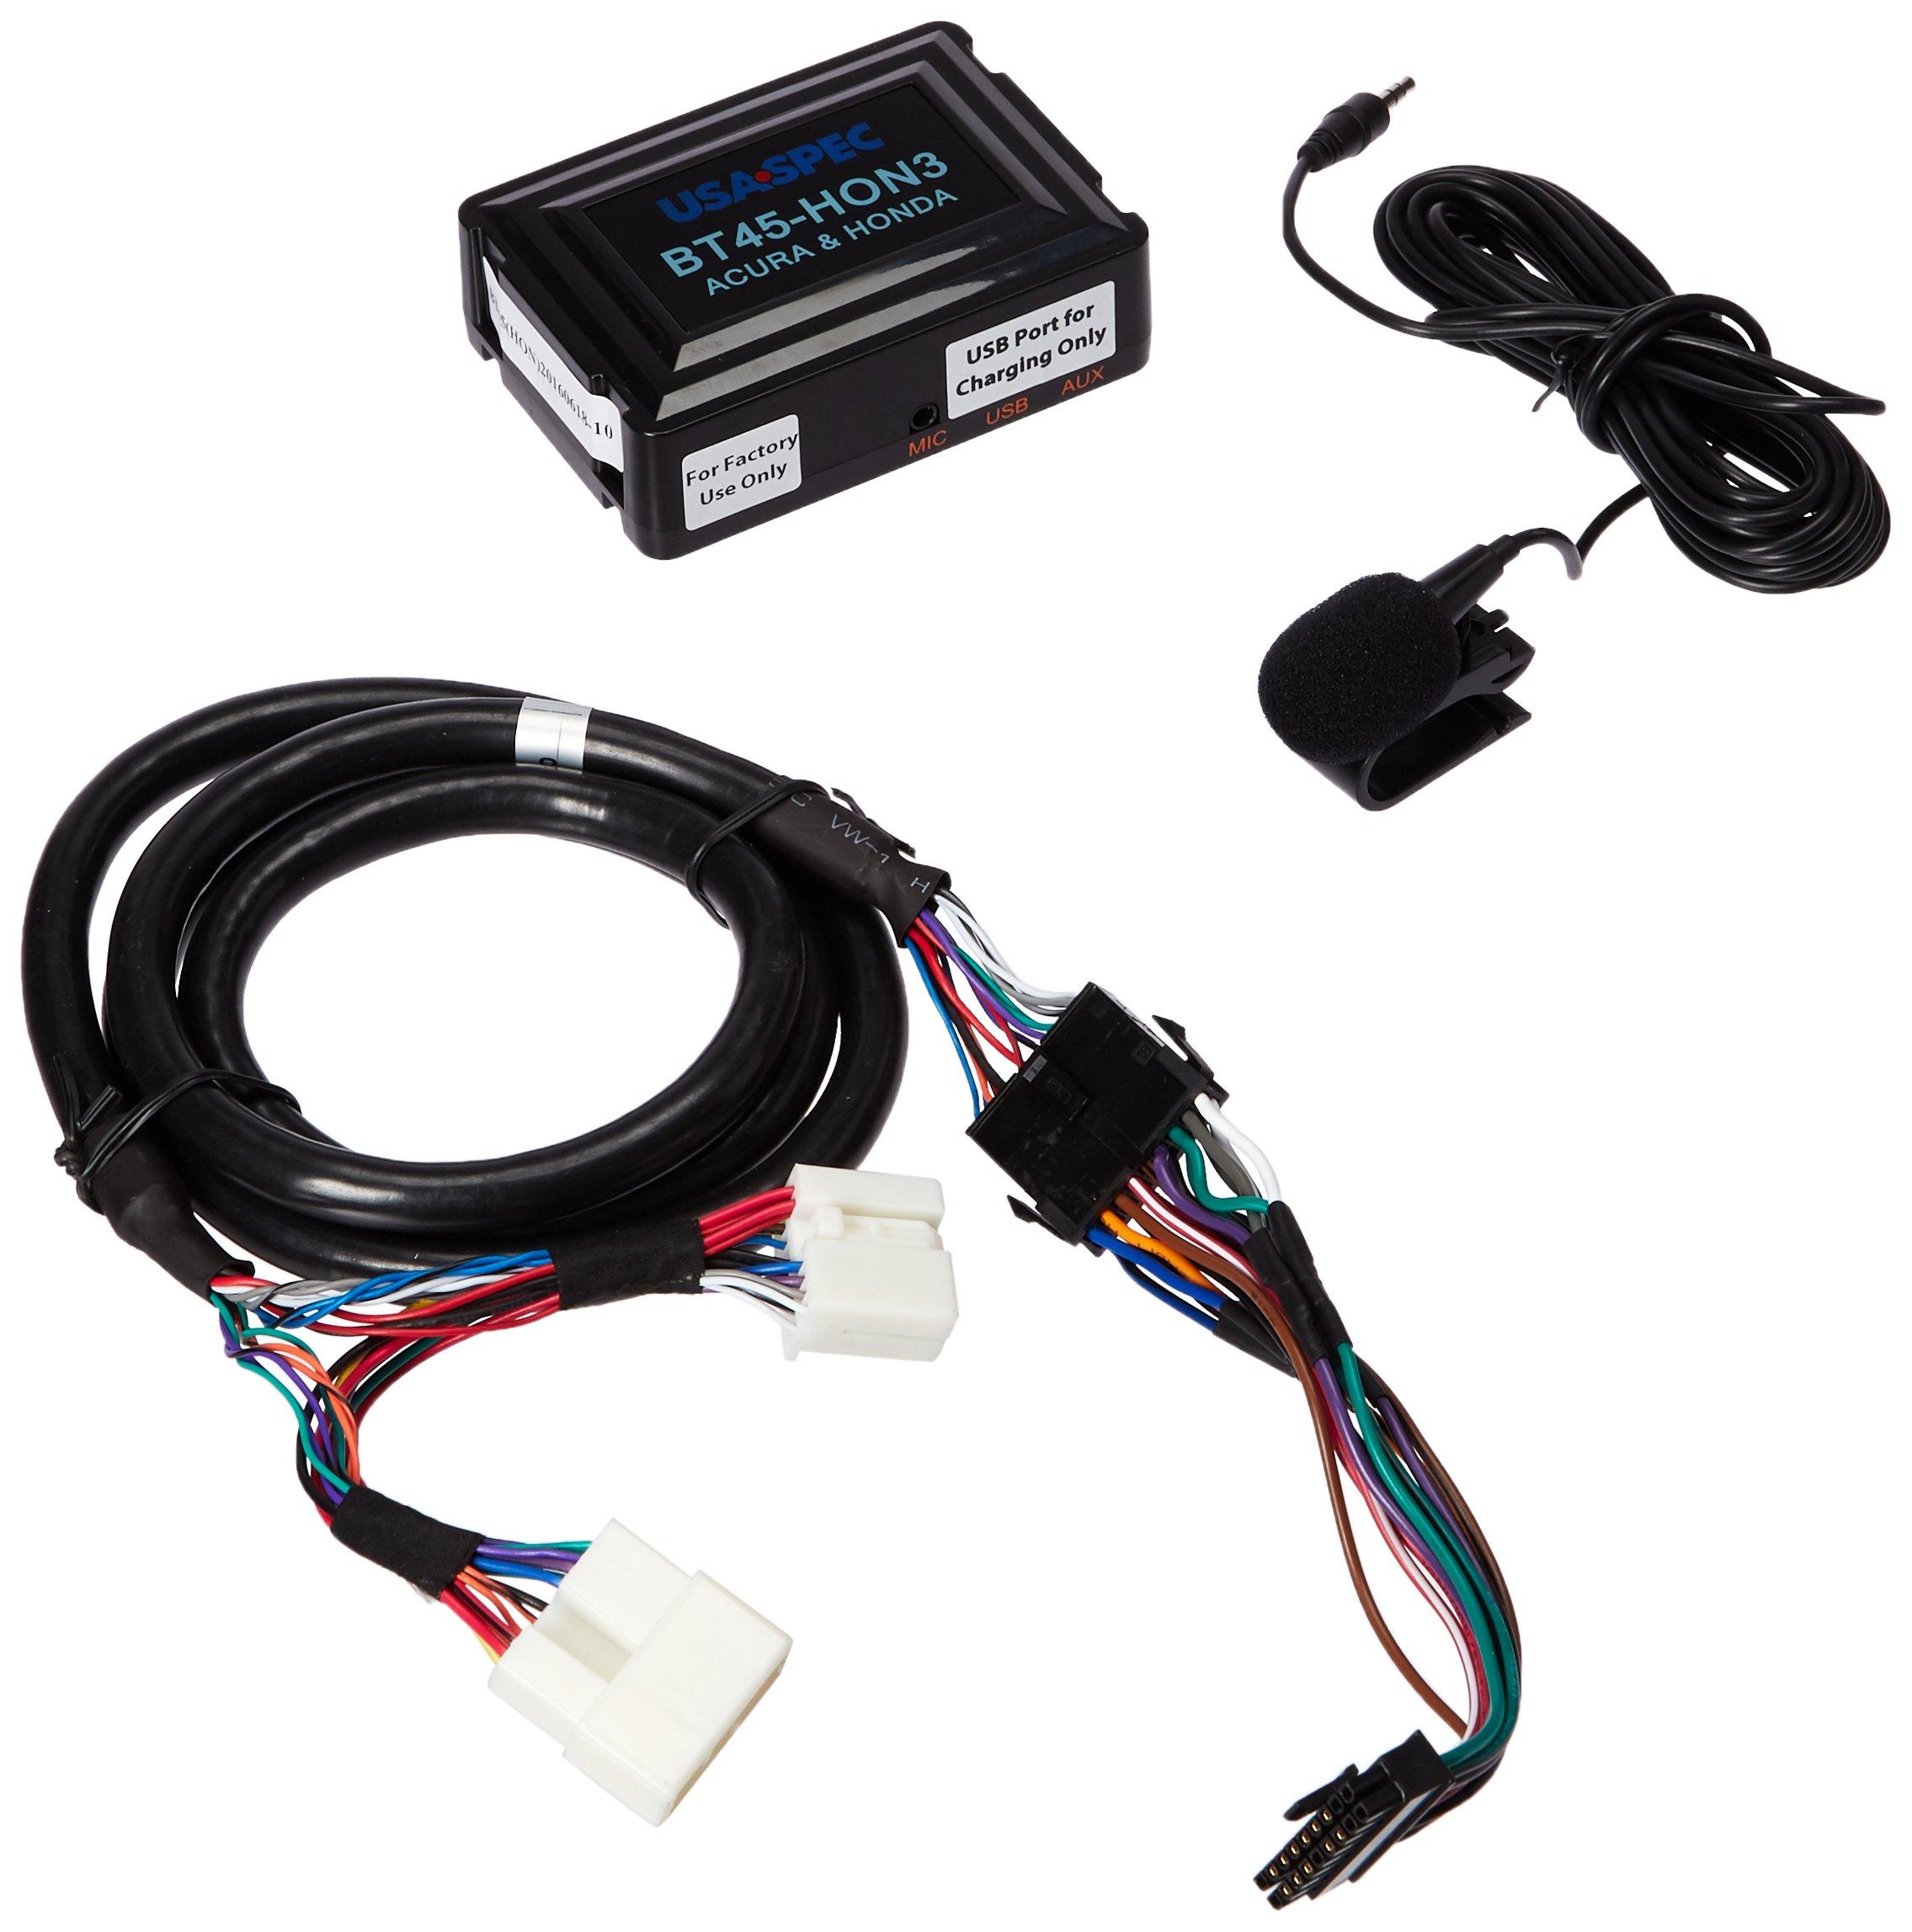 USA SPEC BT45-HON3 Bluetooth Phone, Music & AUX Input Kit for Select 2003-2014 Honda & Acura Models